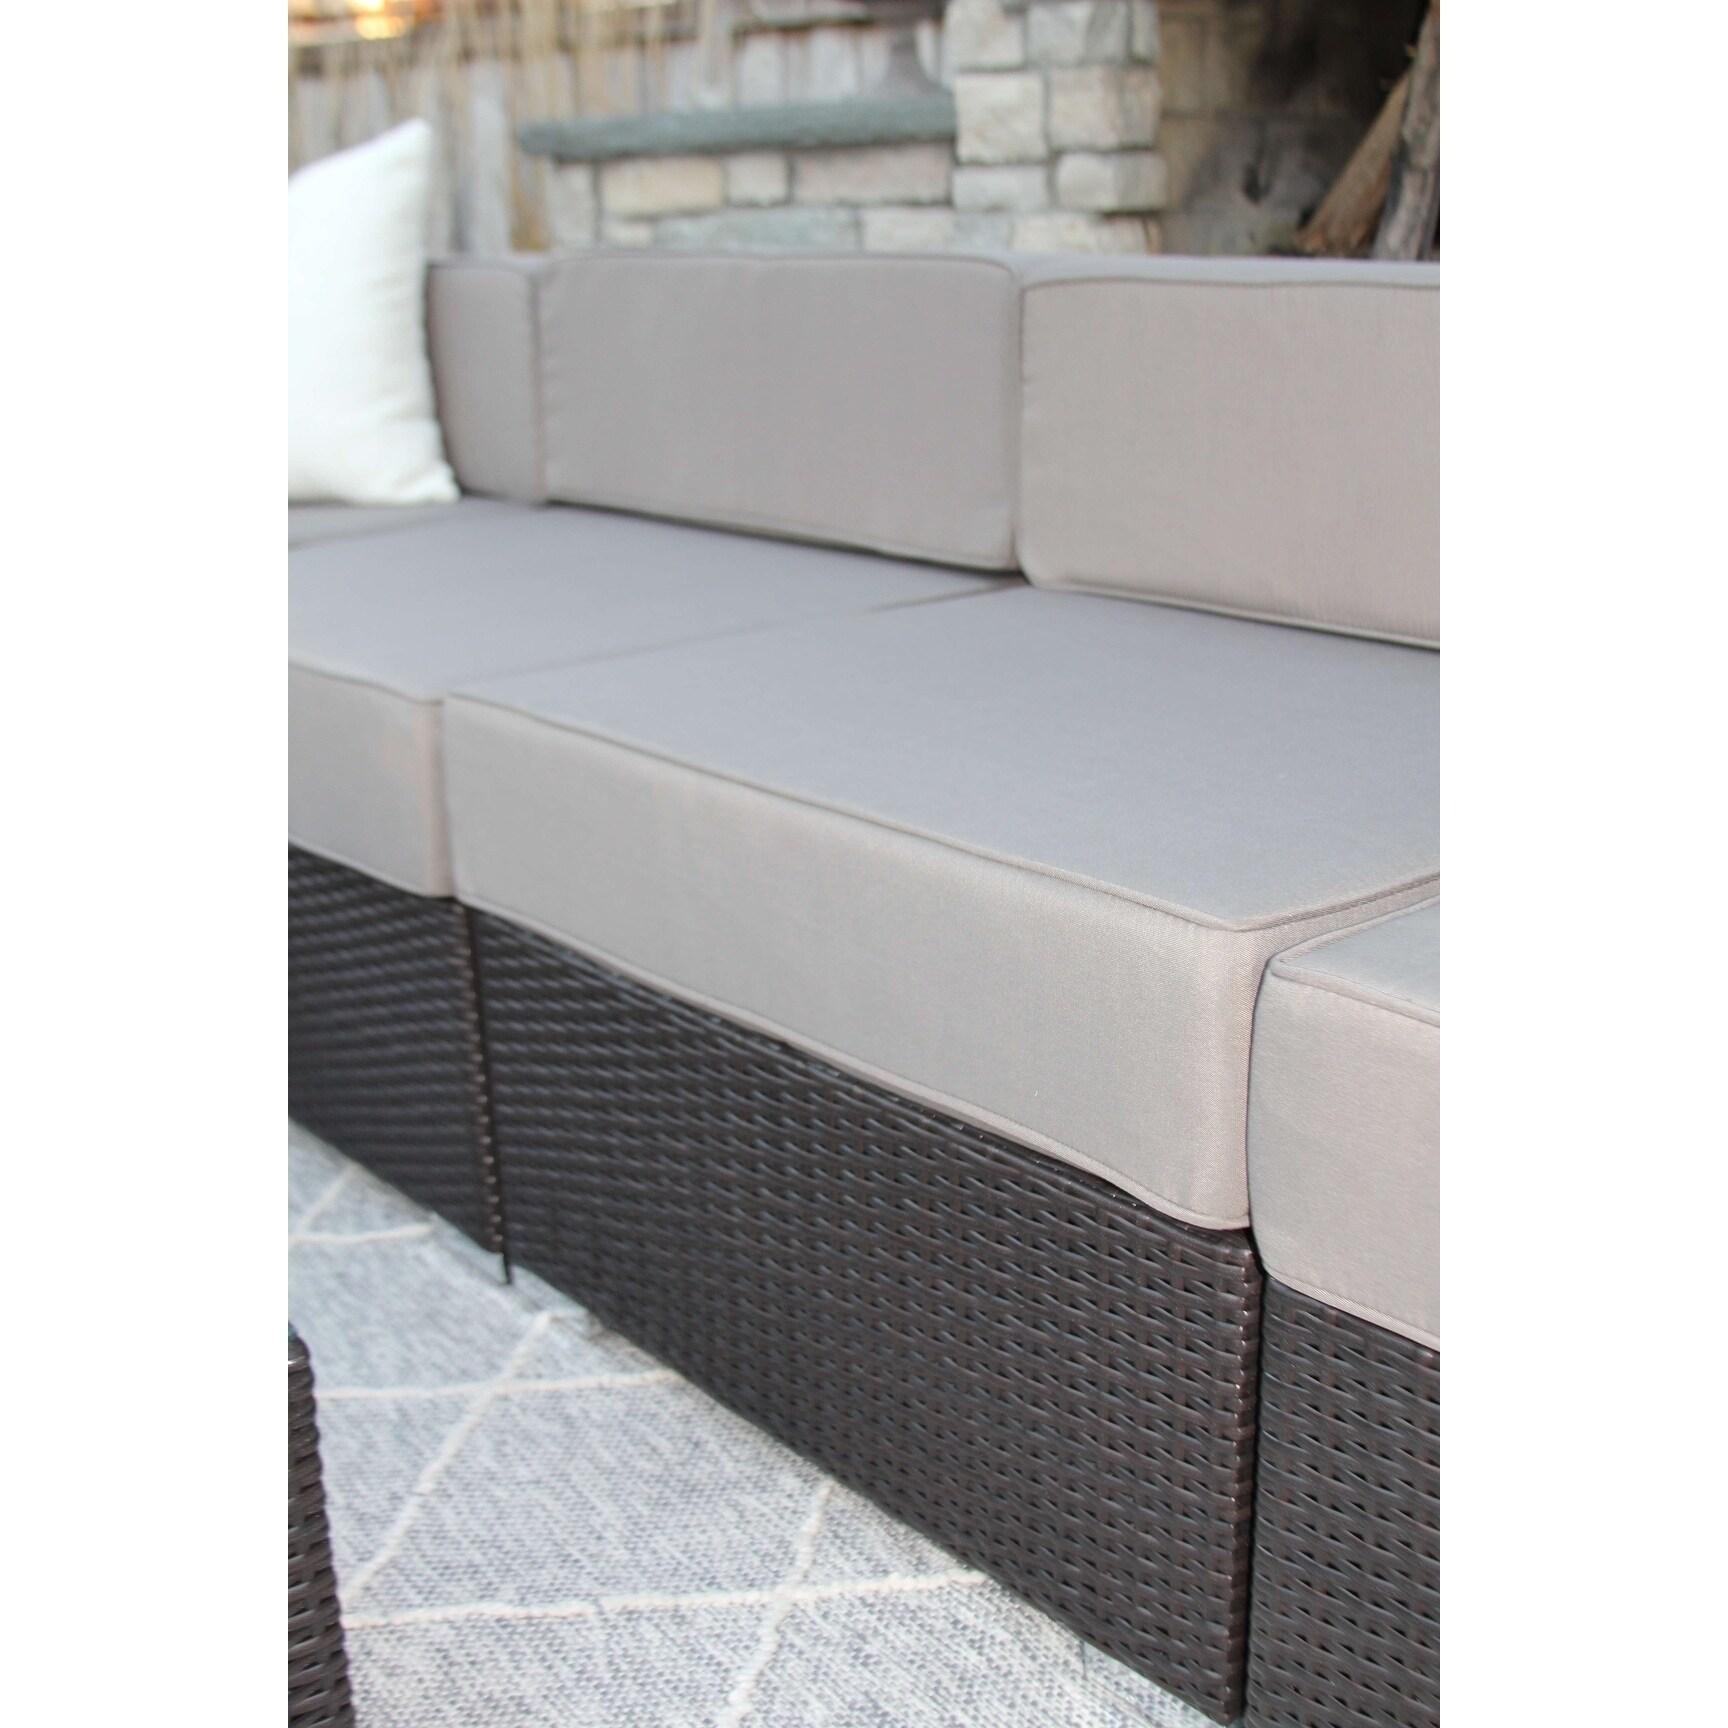 alexandra furniture. Alexandra 7-PC Modern Outdoor Rattan Patio Furniture Sofa Set-Modular - Free Shipping Today Overstock 23942892